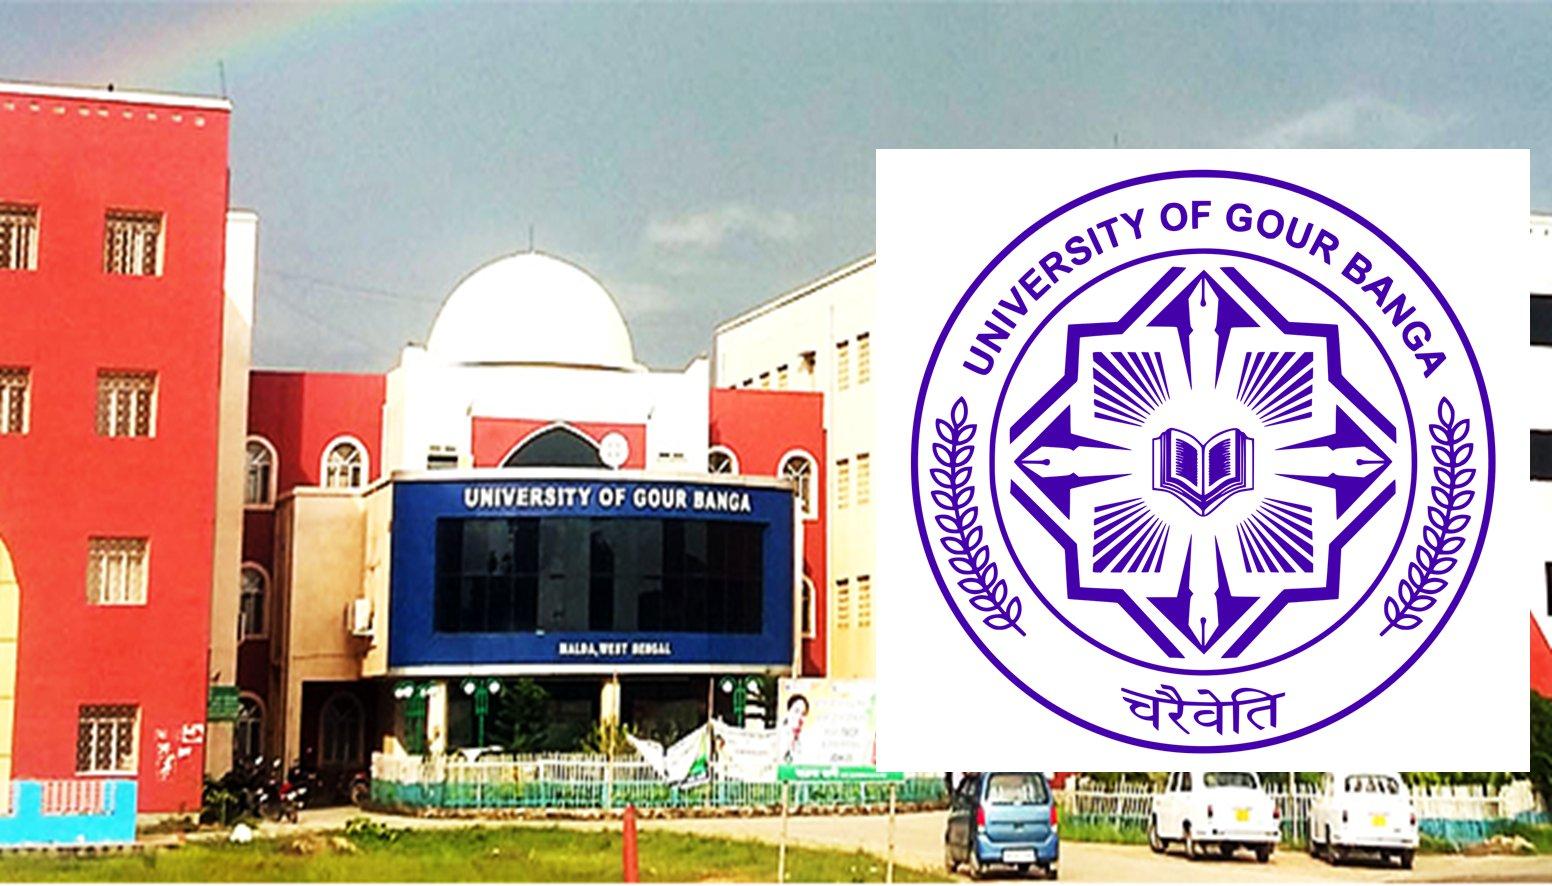 Professor/Associate Professor Positions at University of Gour Banga, West Bengal